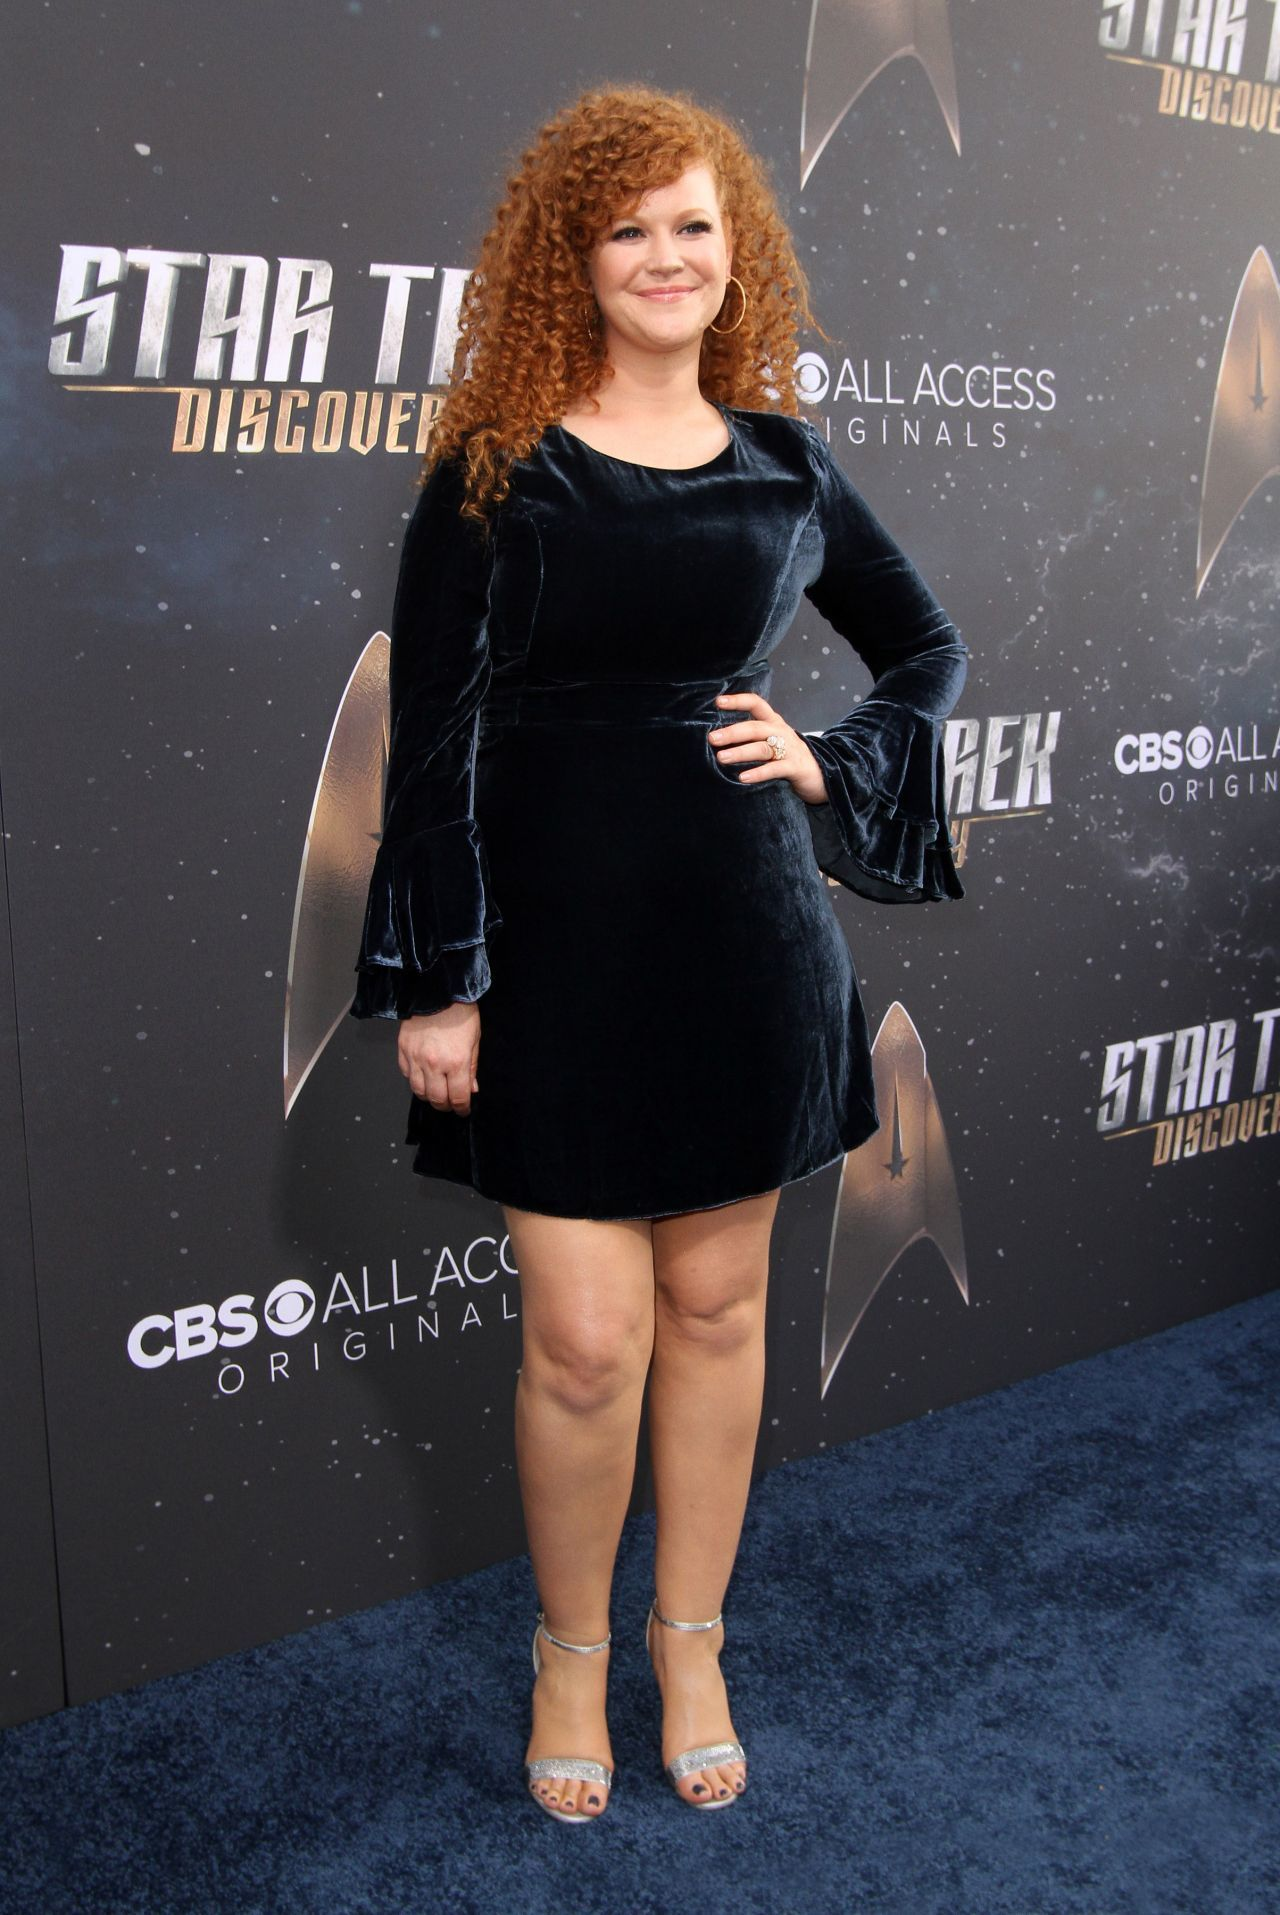 Mary Wiseman, atriz de Star Trek: Discovery. (Foto: Reprodução / Pinterest)